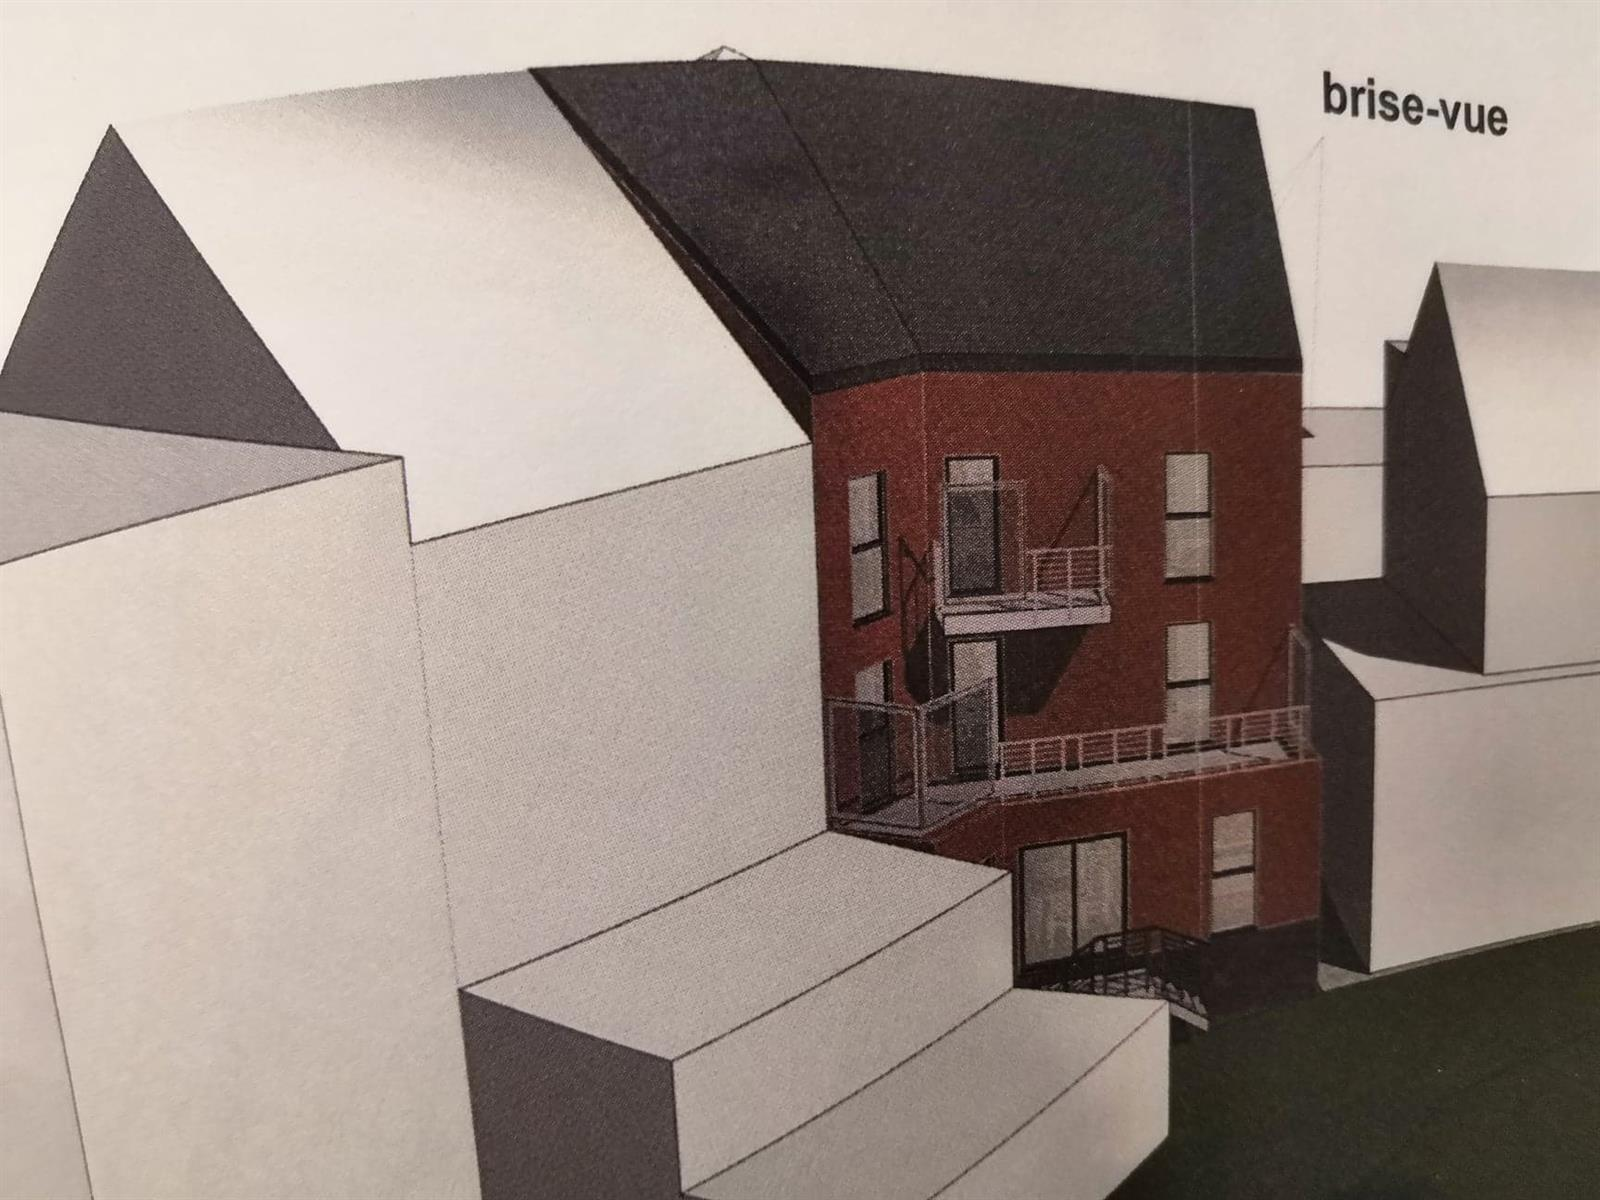 Terrain à bâtir (projets) - Charleroi - #3957840-4